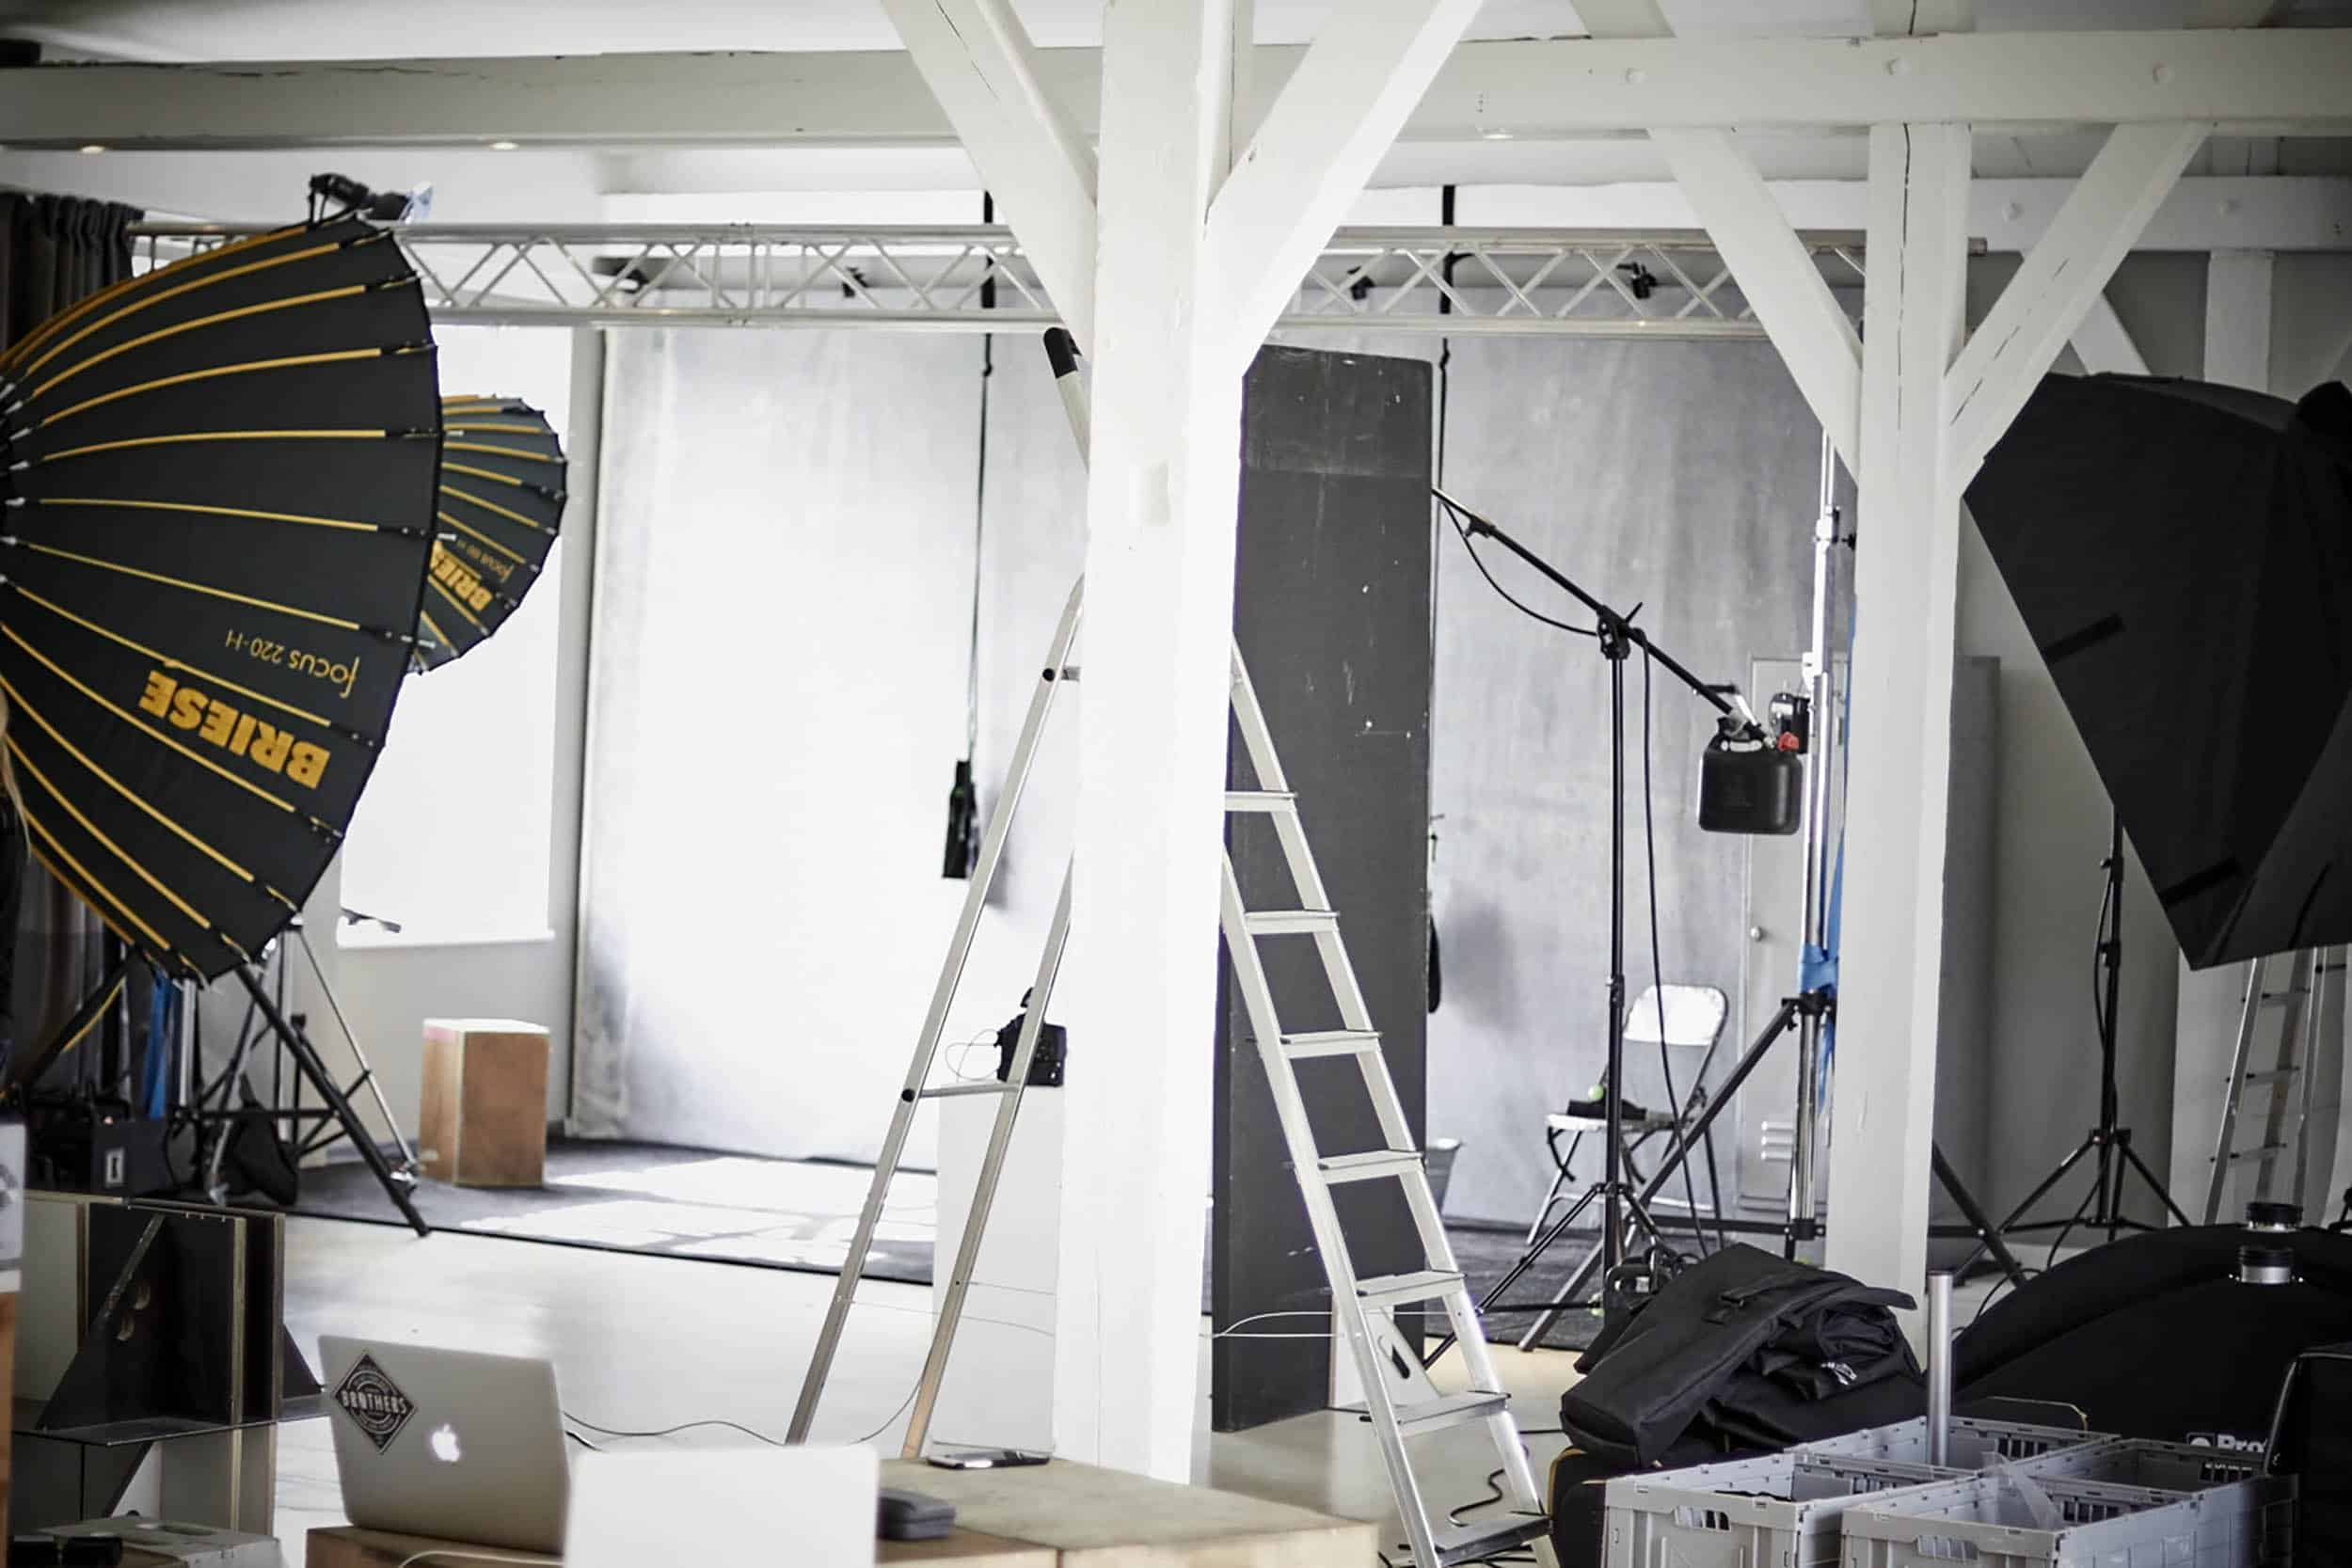 studio-ignatov-klitschko-warsteiner-imagekampagne-makingof-03